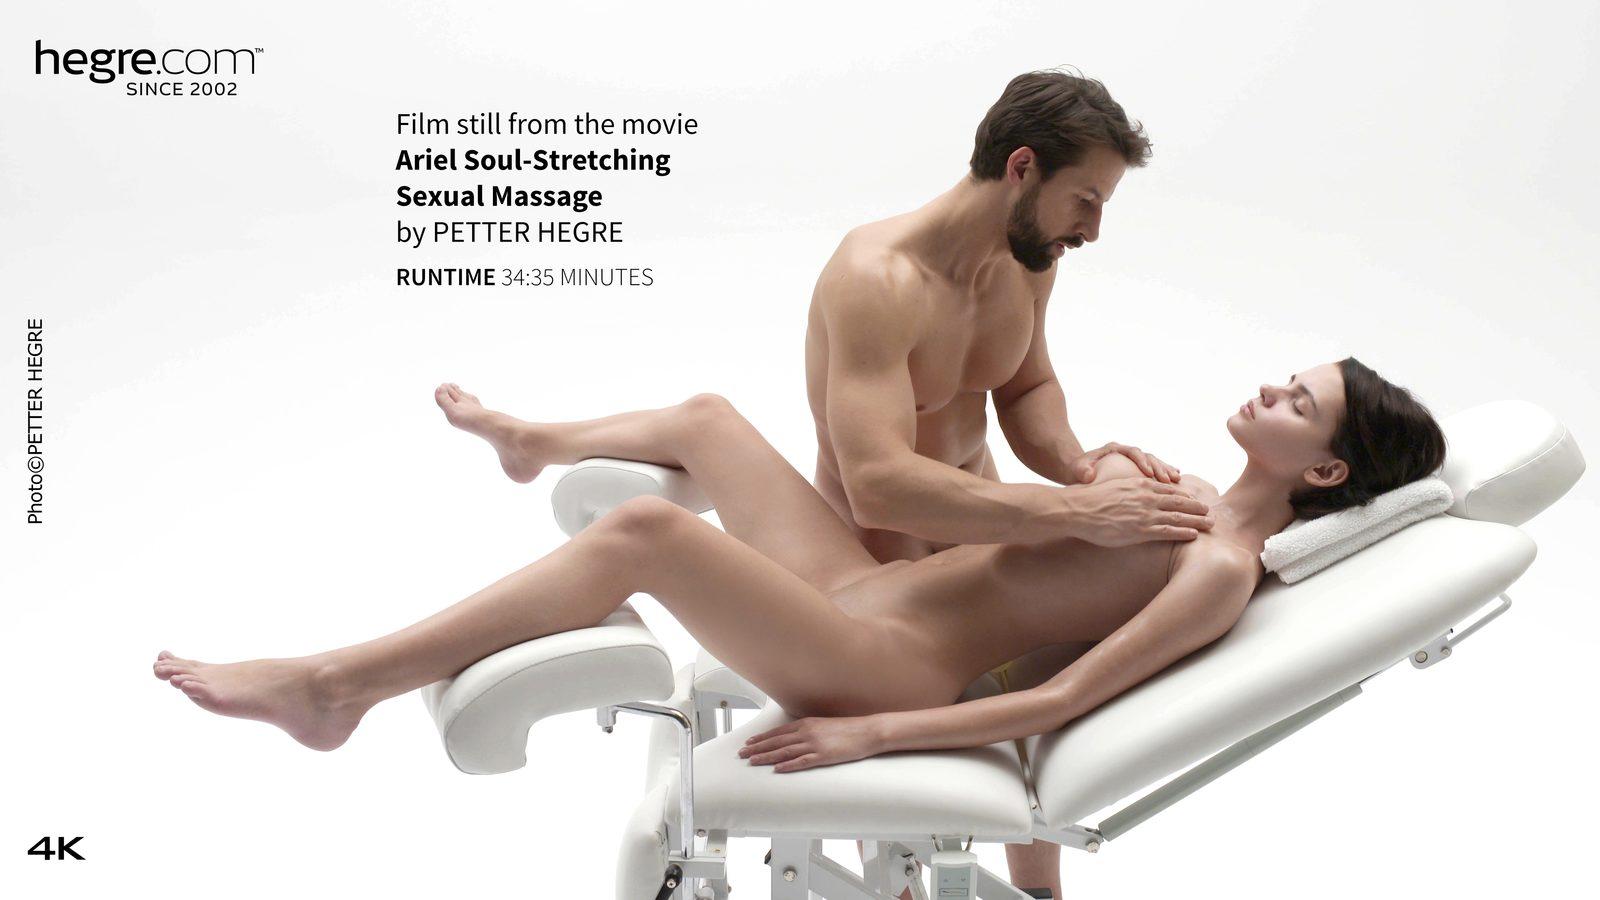 287452 hegre-art 2017-02-28 Ariel Soul-Stretching Sexual Massage